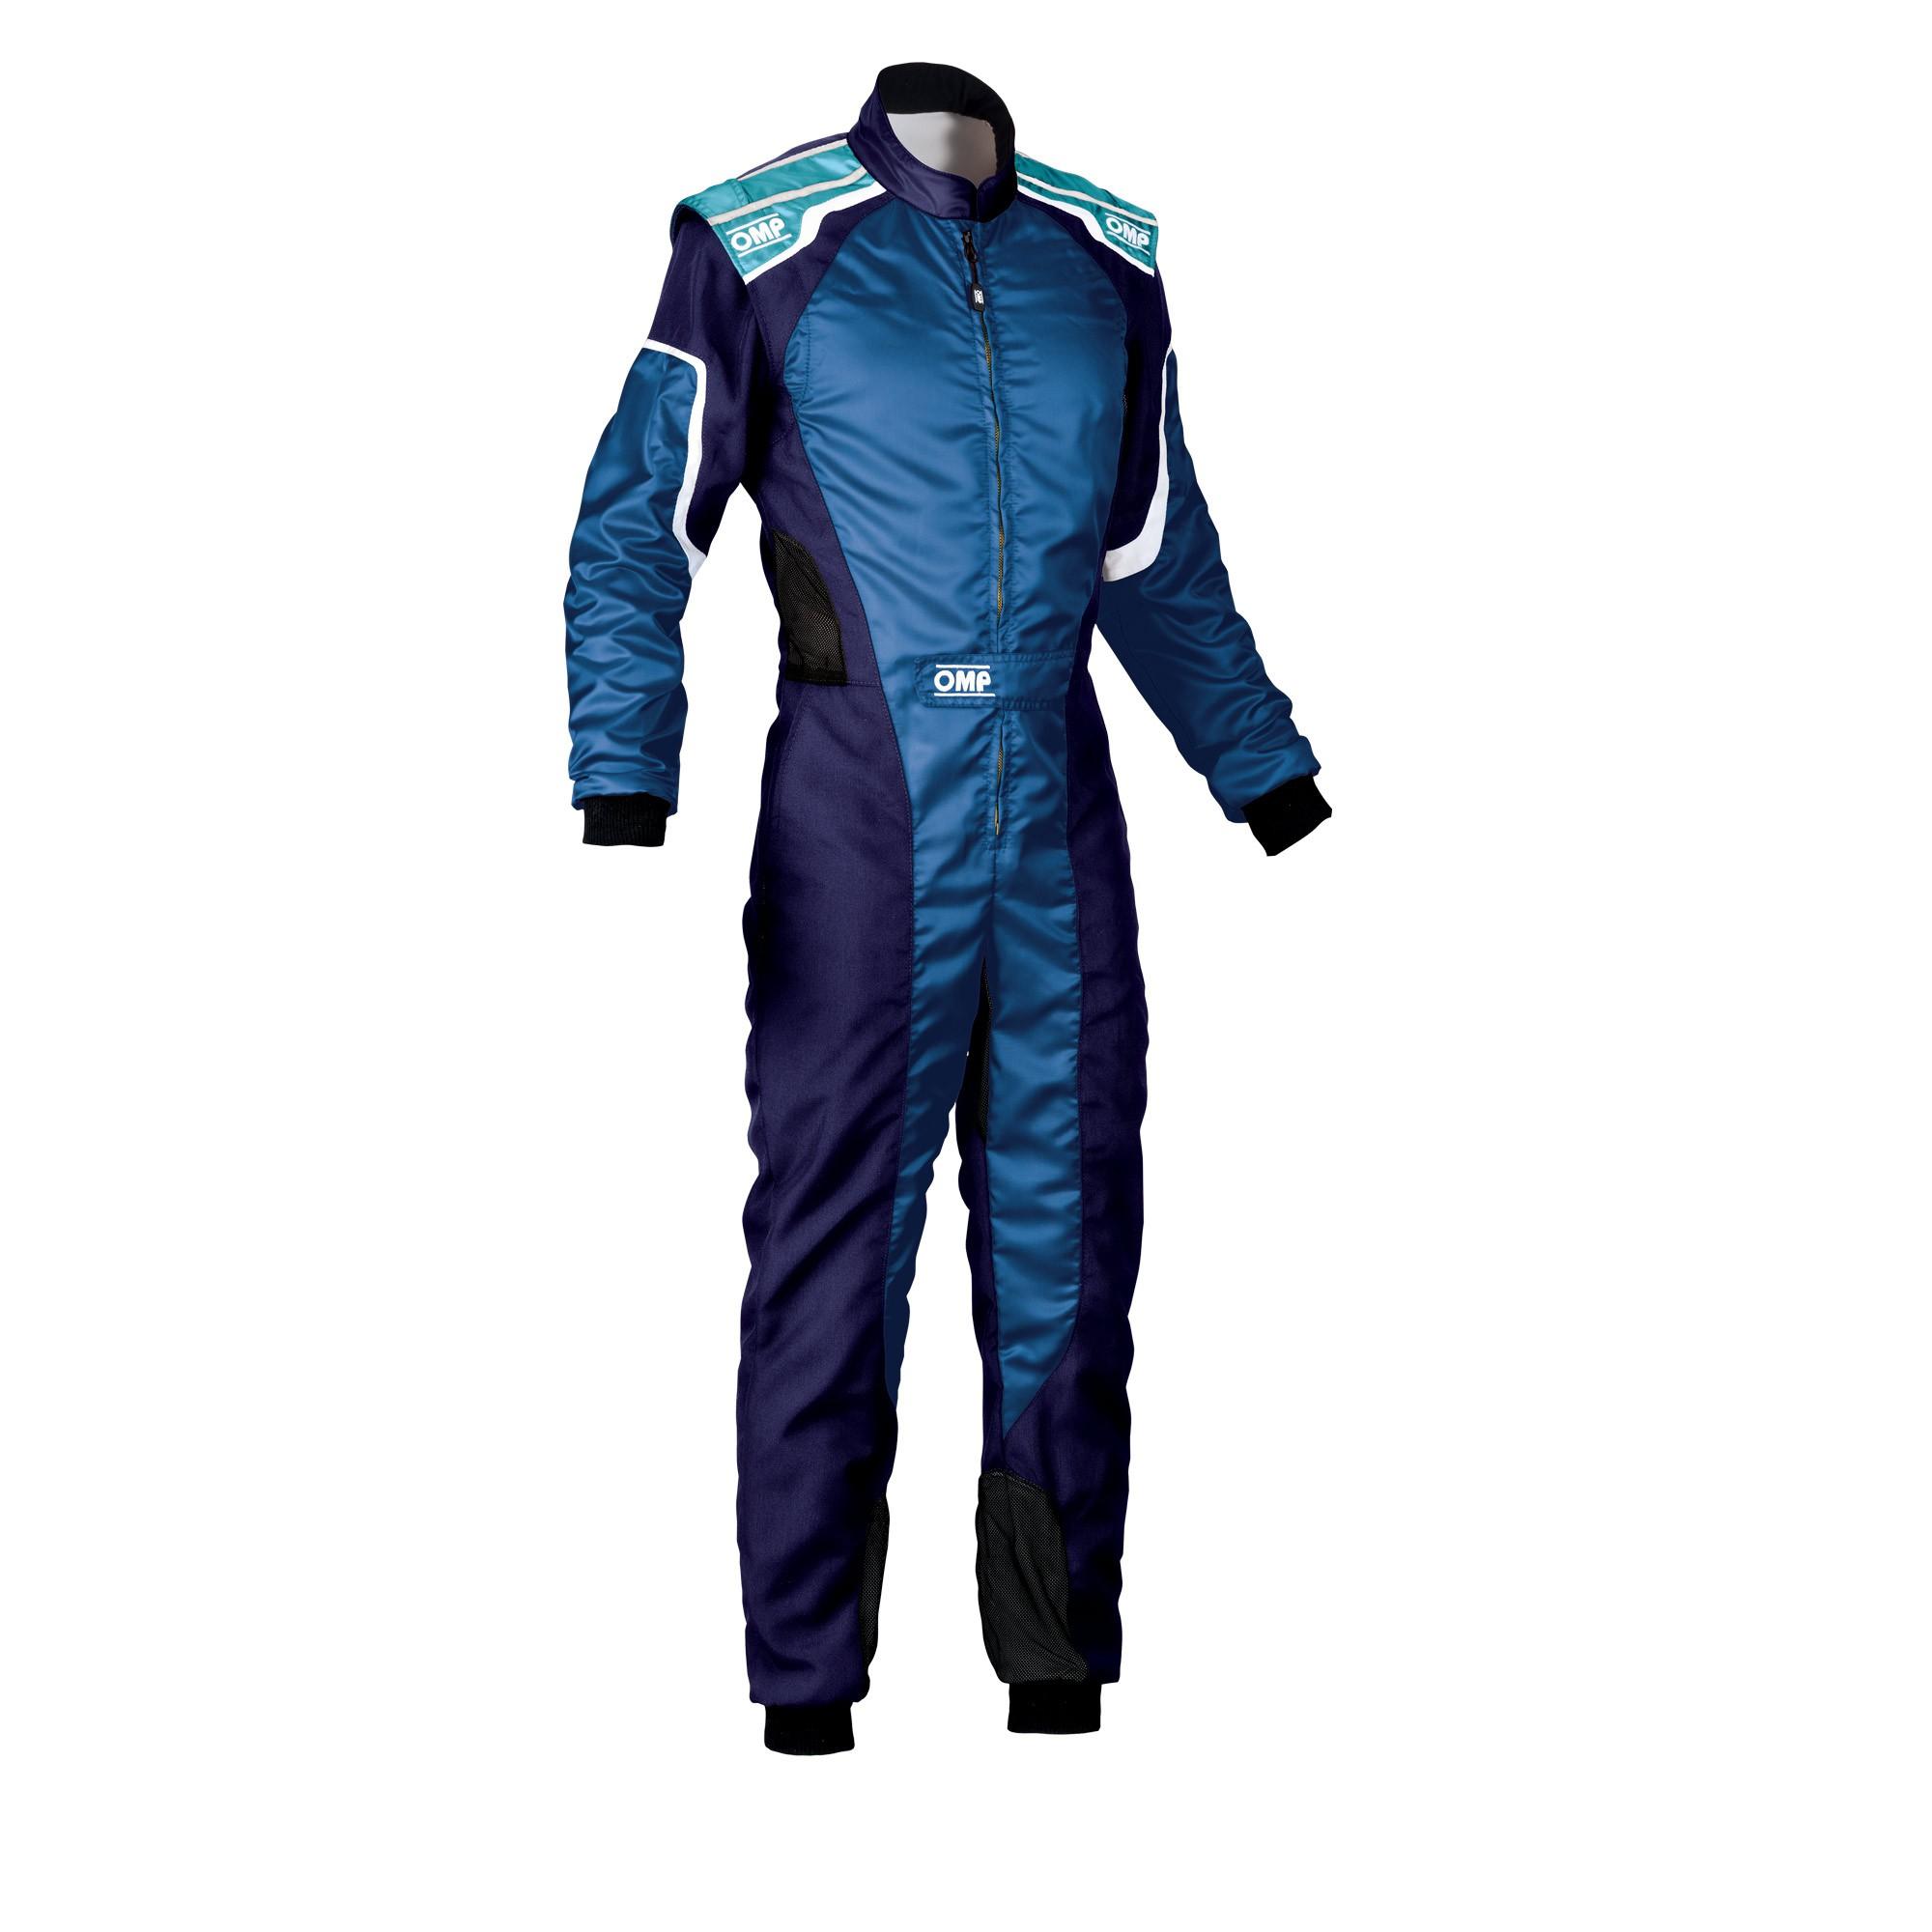 KS-3 Suit my2019